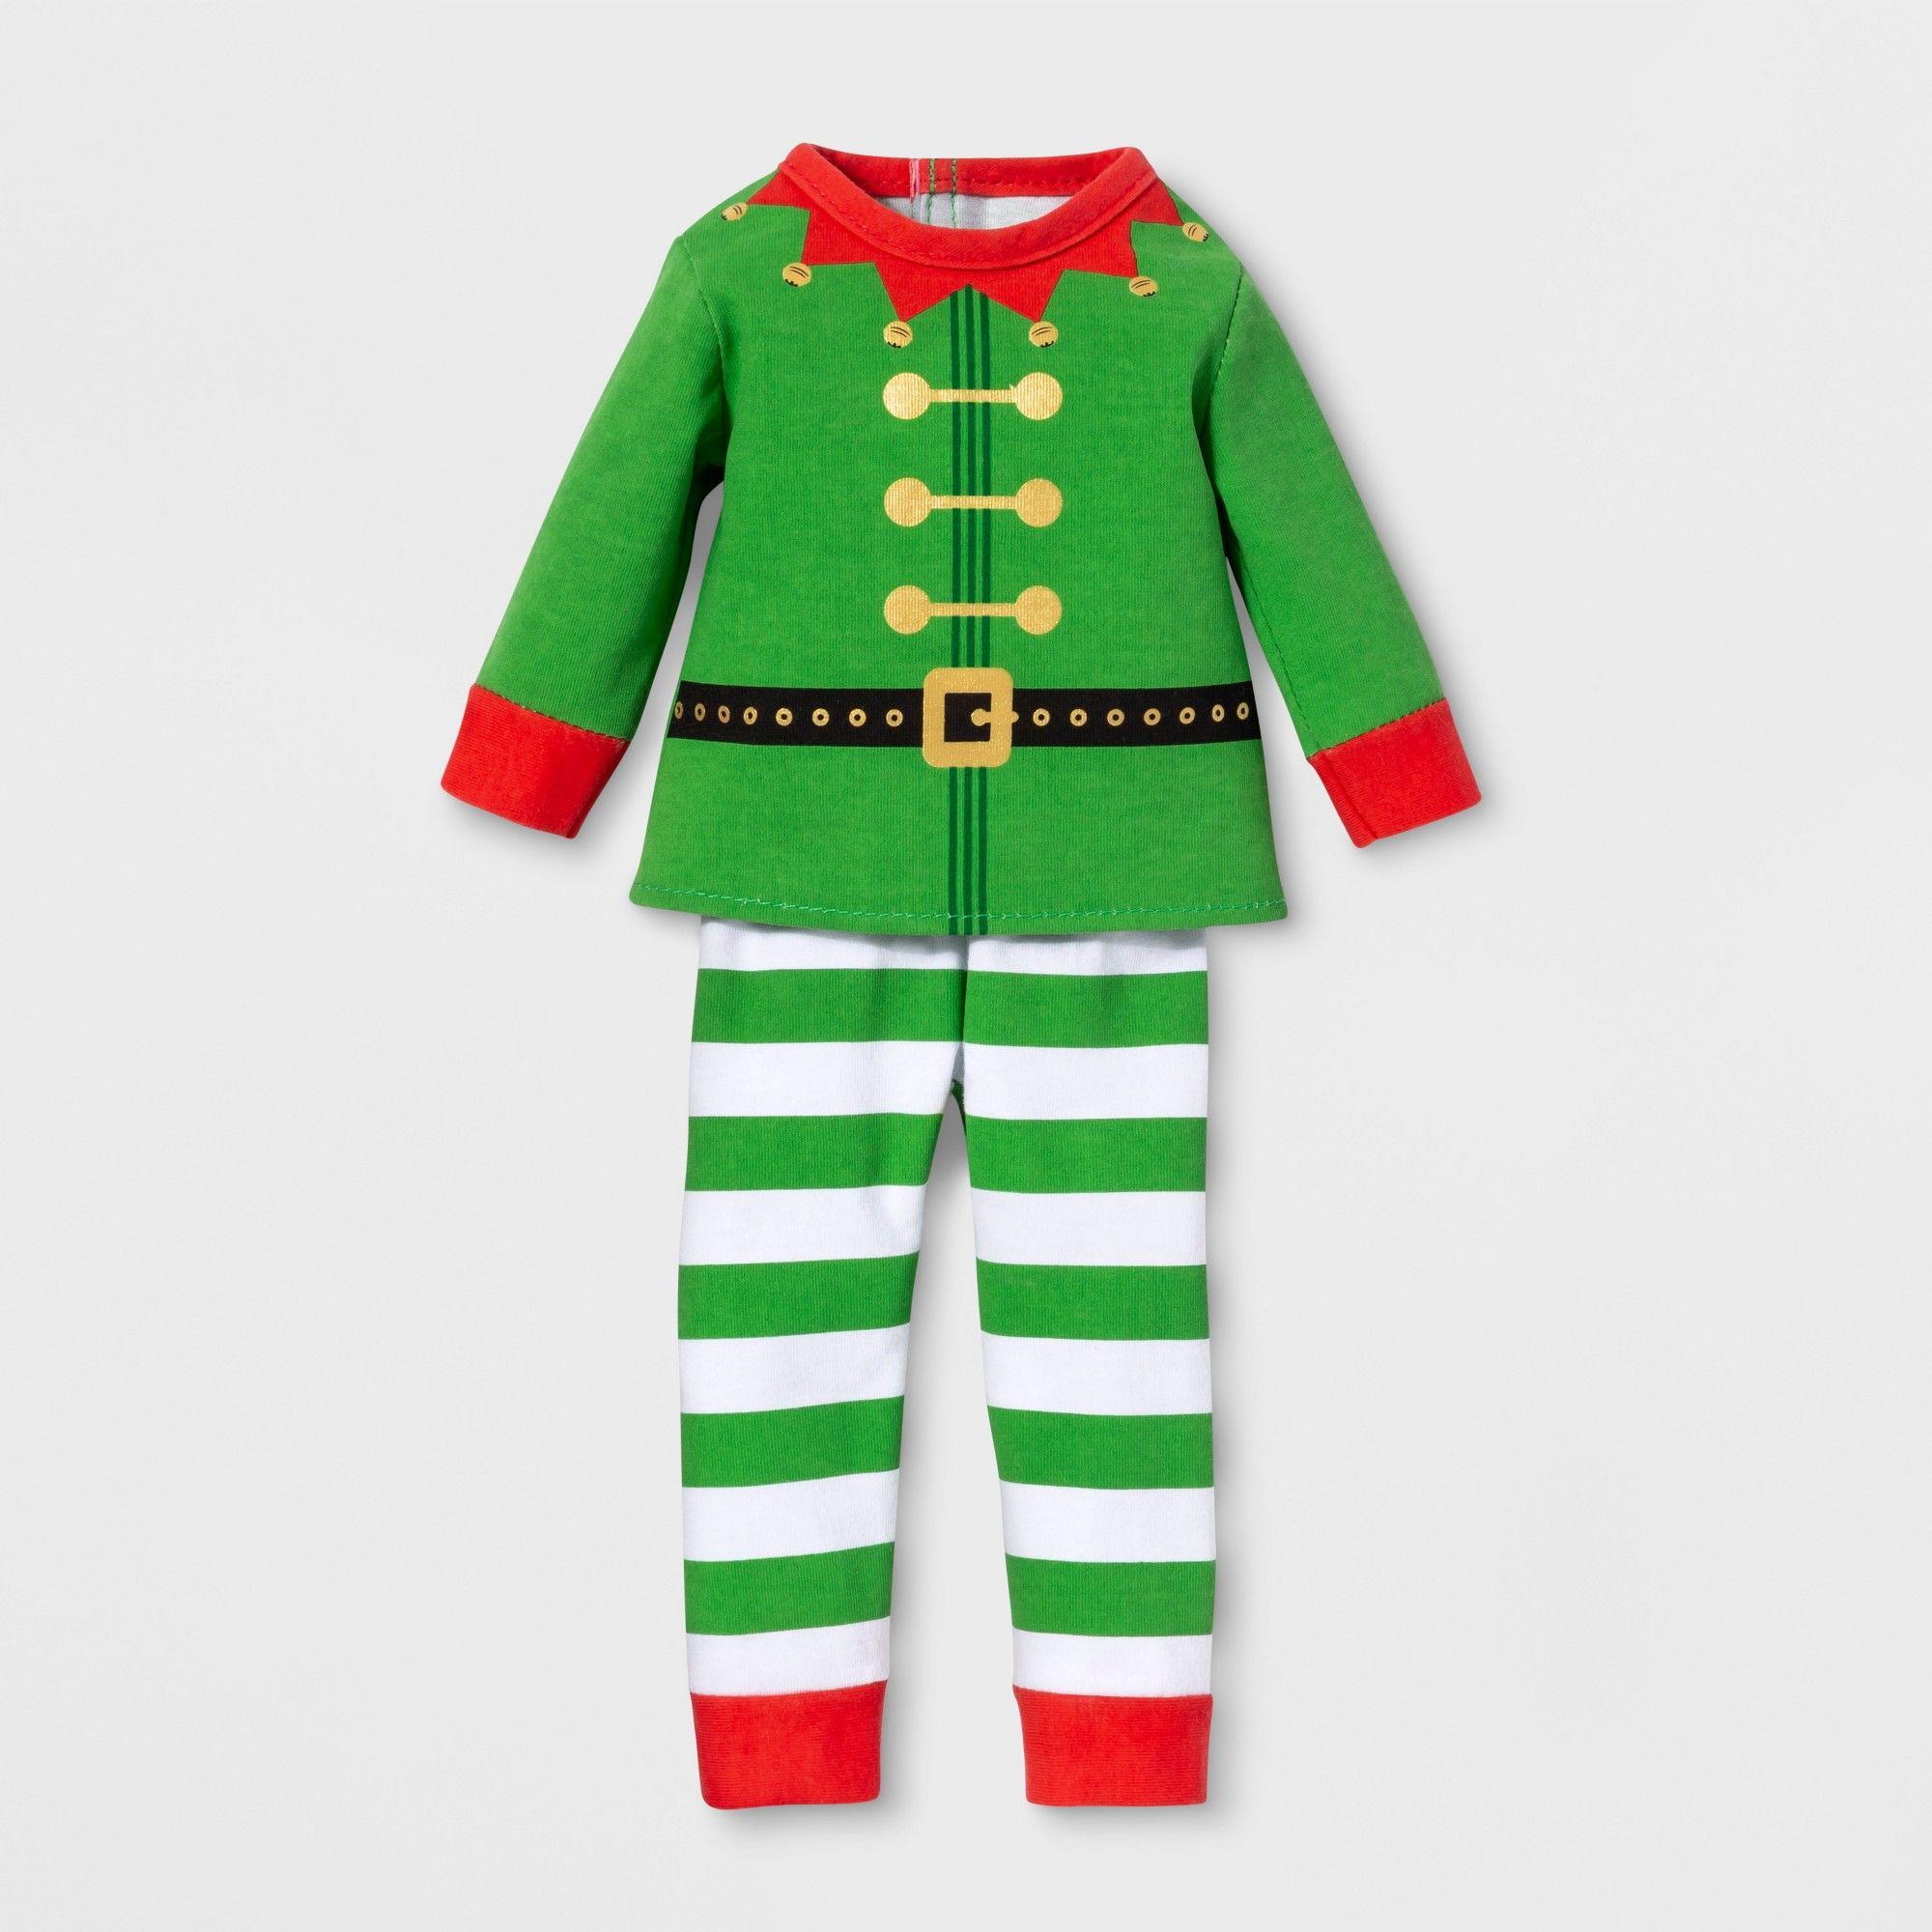 "Wondershop Christmas Plaid Nightgown Pajama Dress 18/"" Our Generation AG doll"